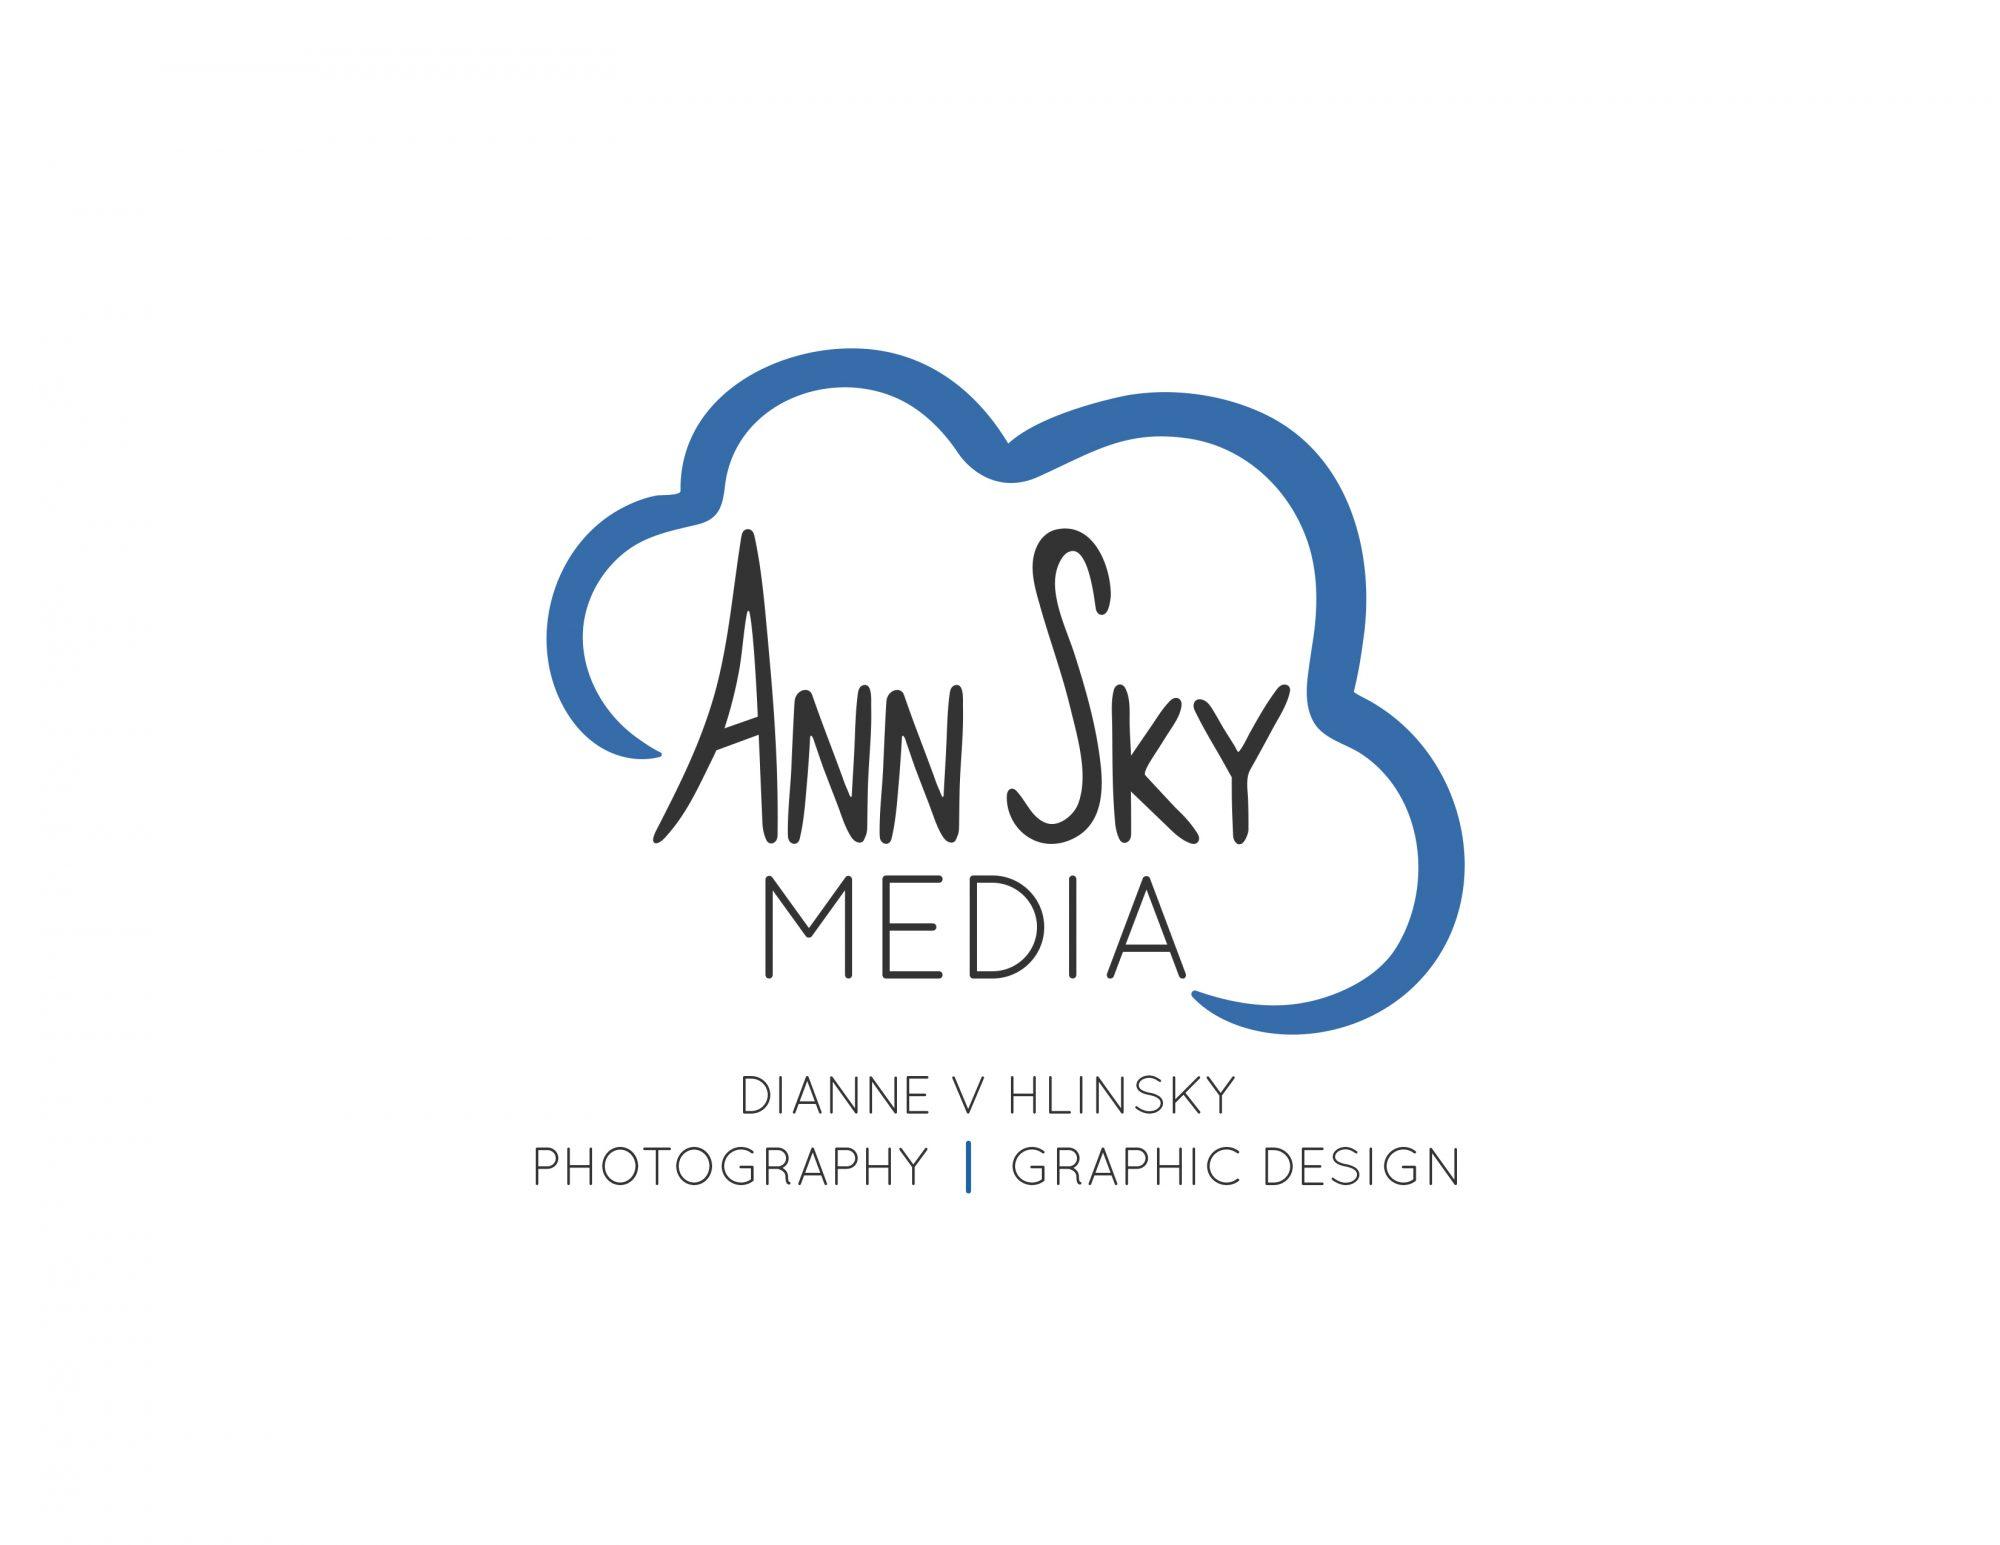 AnnSky Media is being redesigned